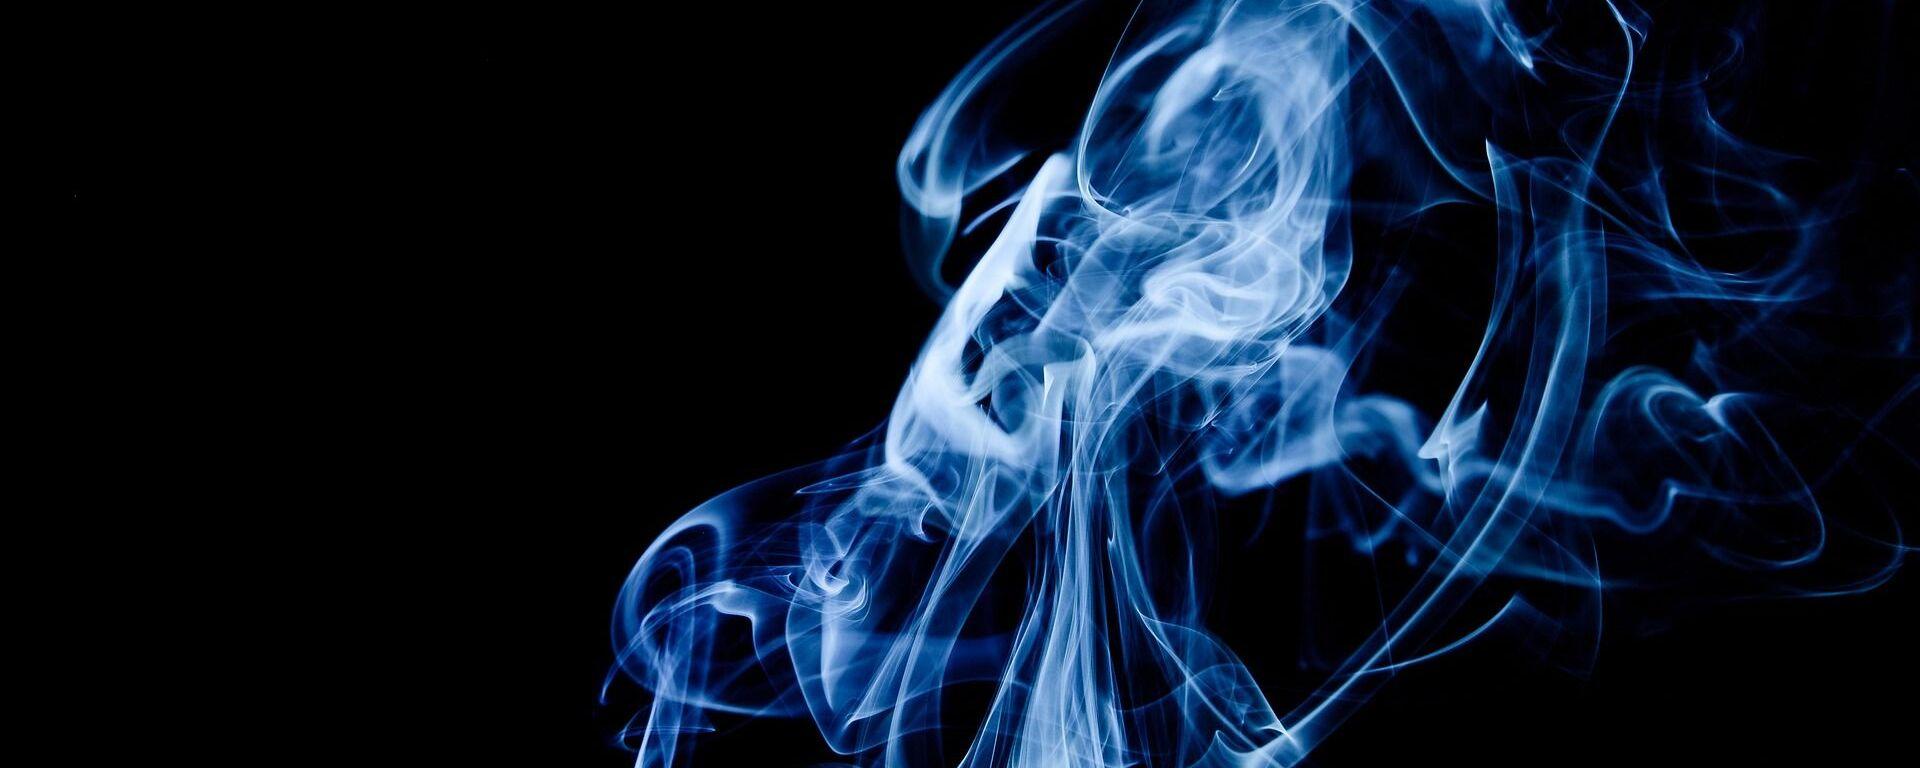 Imagen referencial de humo de tabaco - Sputnik Mundo, 1920, 05.07.2021